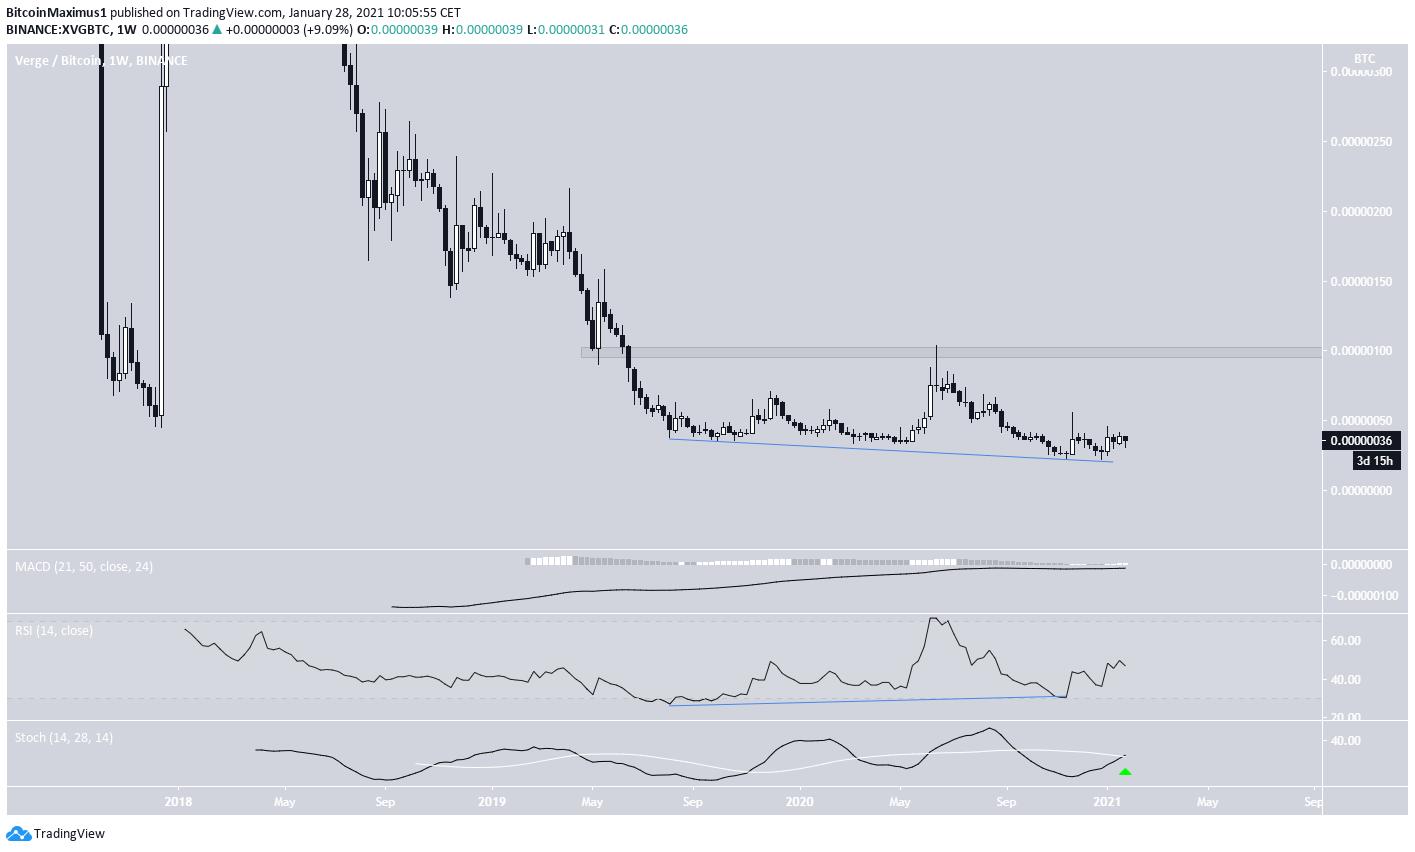 XVG/BTC Divergence